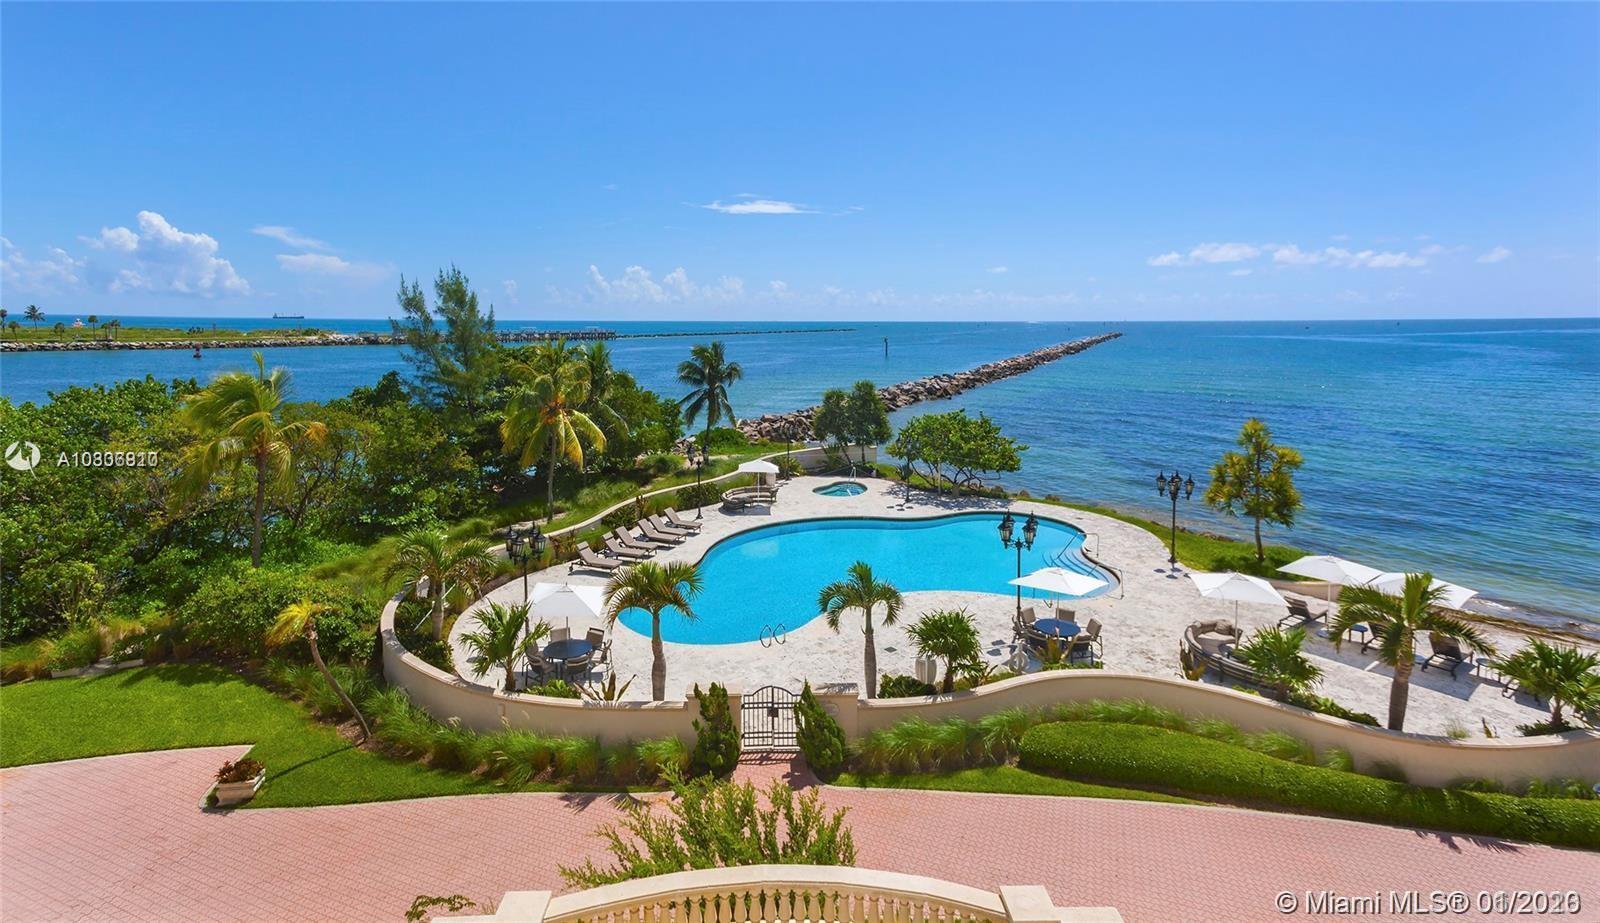 7233 Fisher Island Dr 7233, Miami Beach, FL 33109